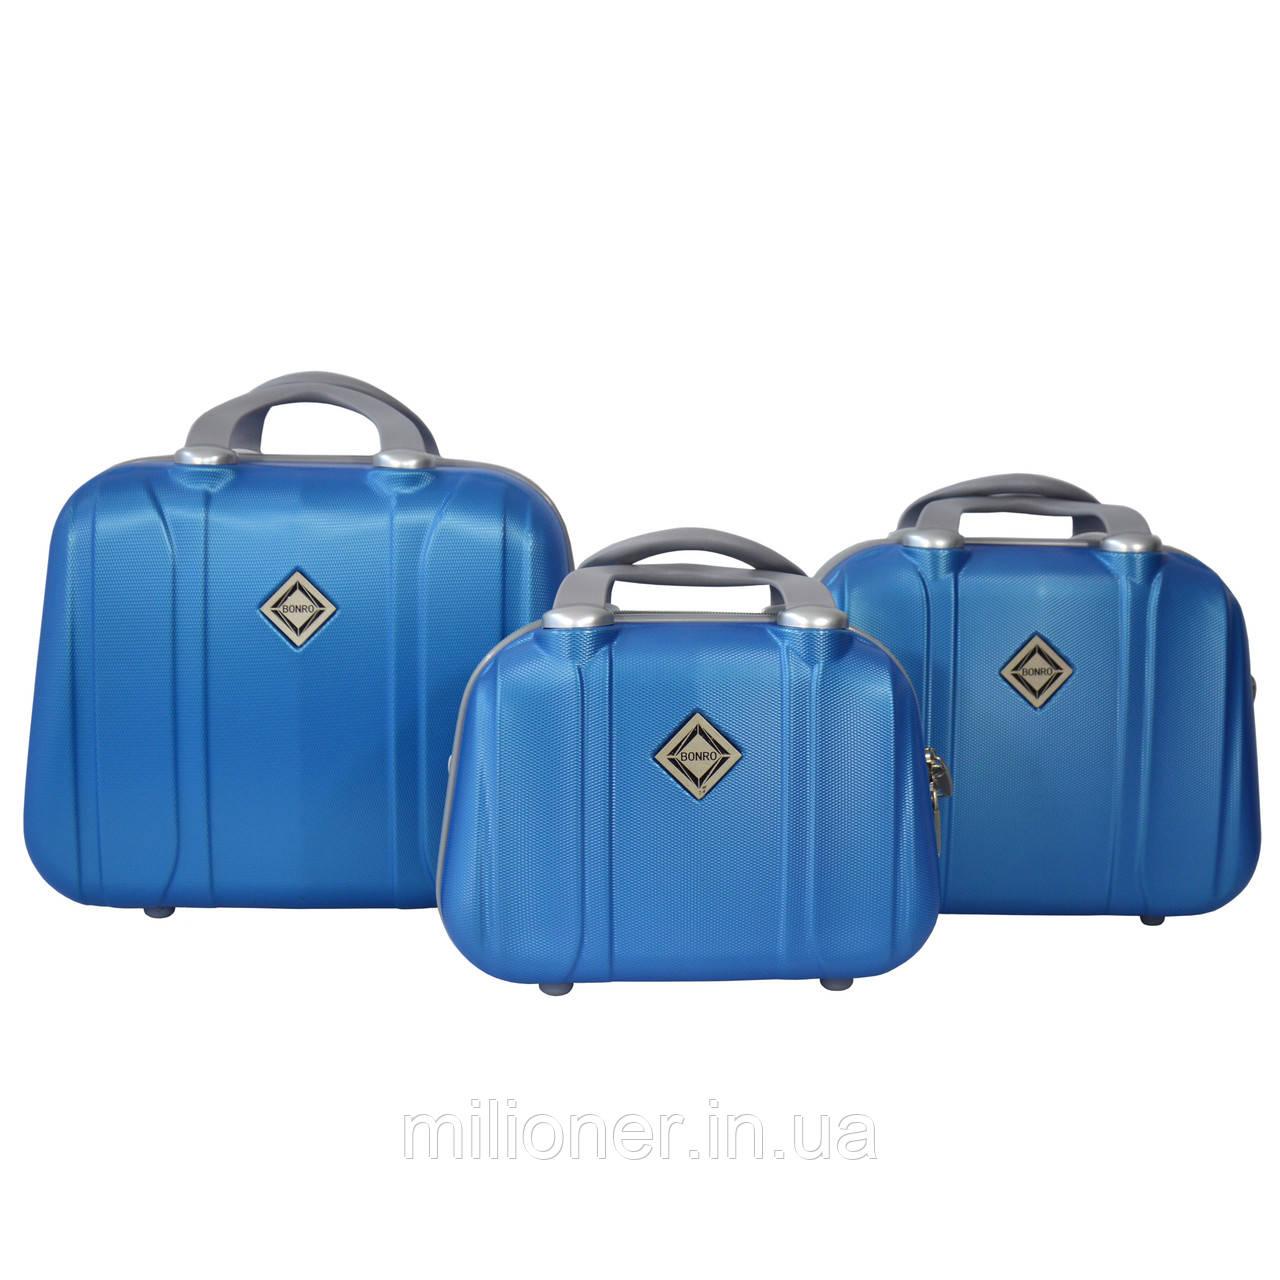 Сумка кейс саквояж 3в1 Bonro Smile светло синий (blue 656)